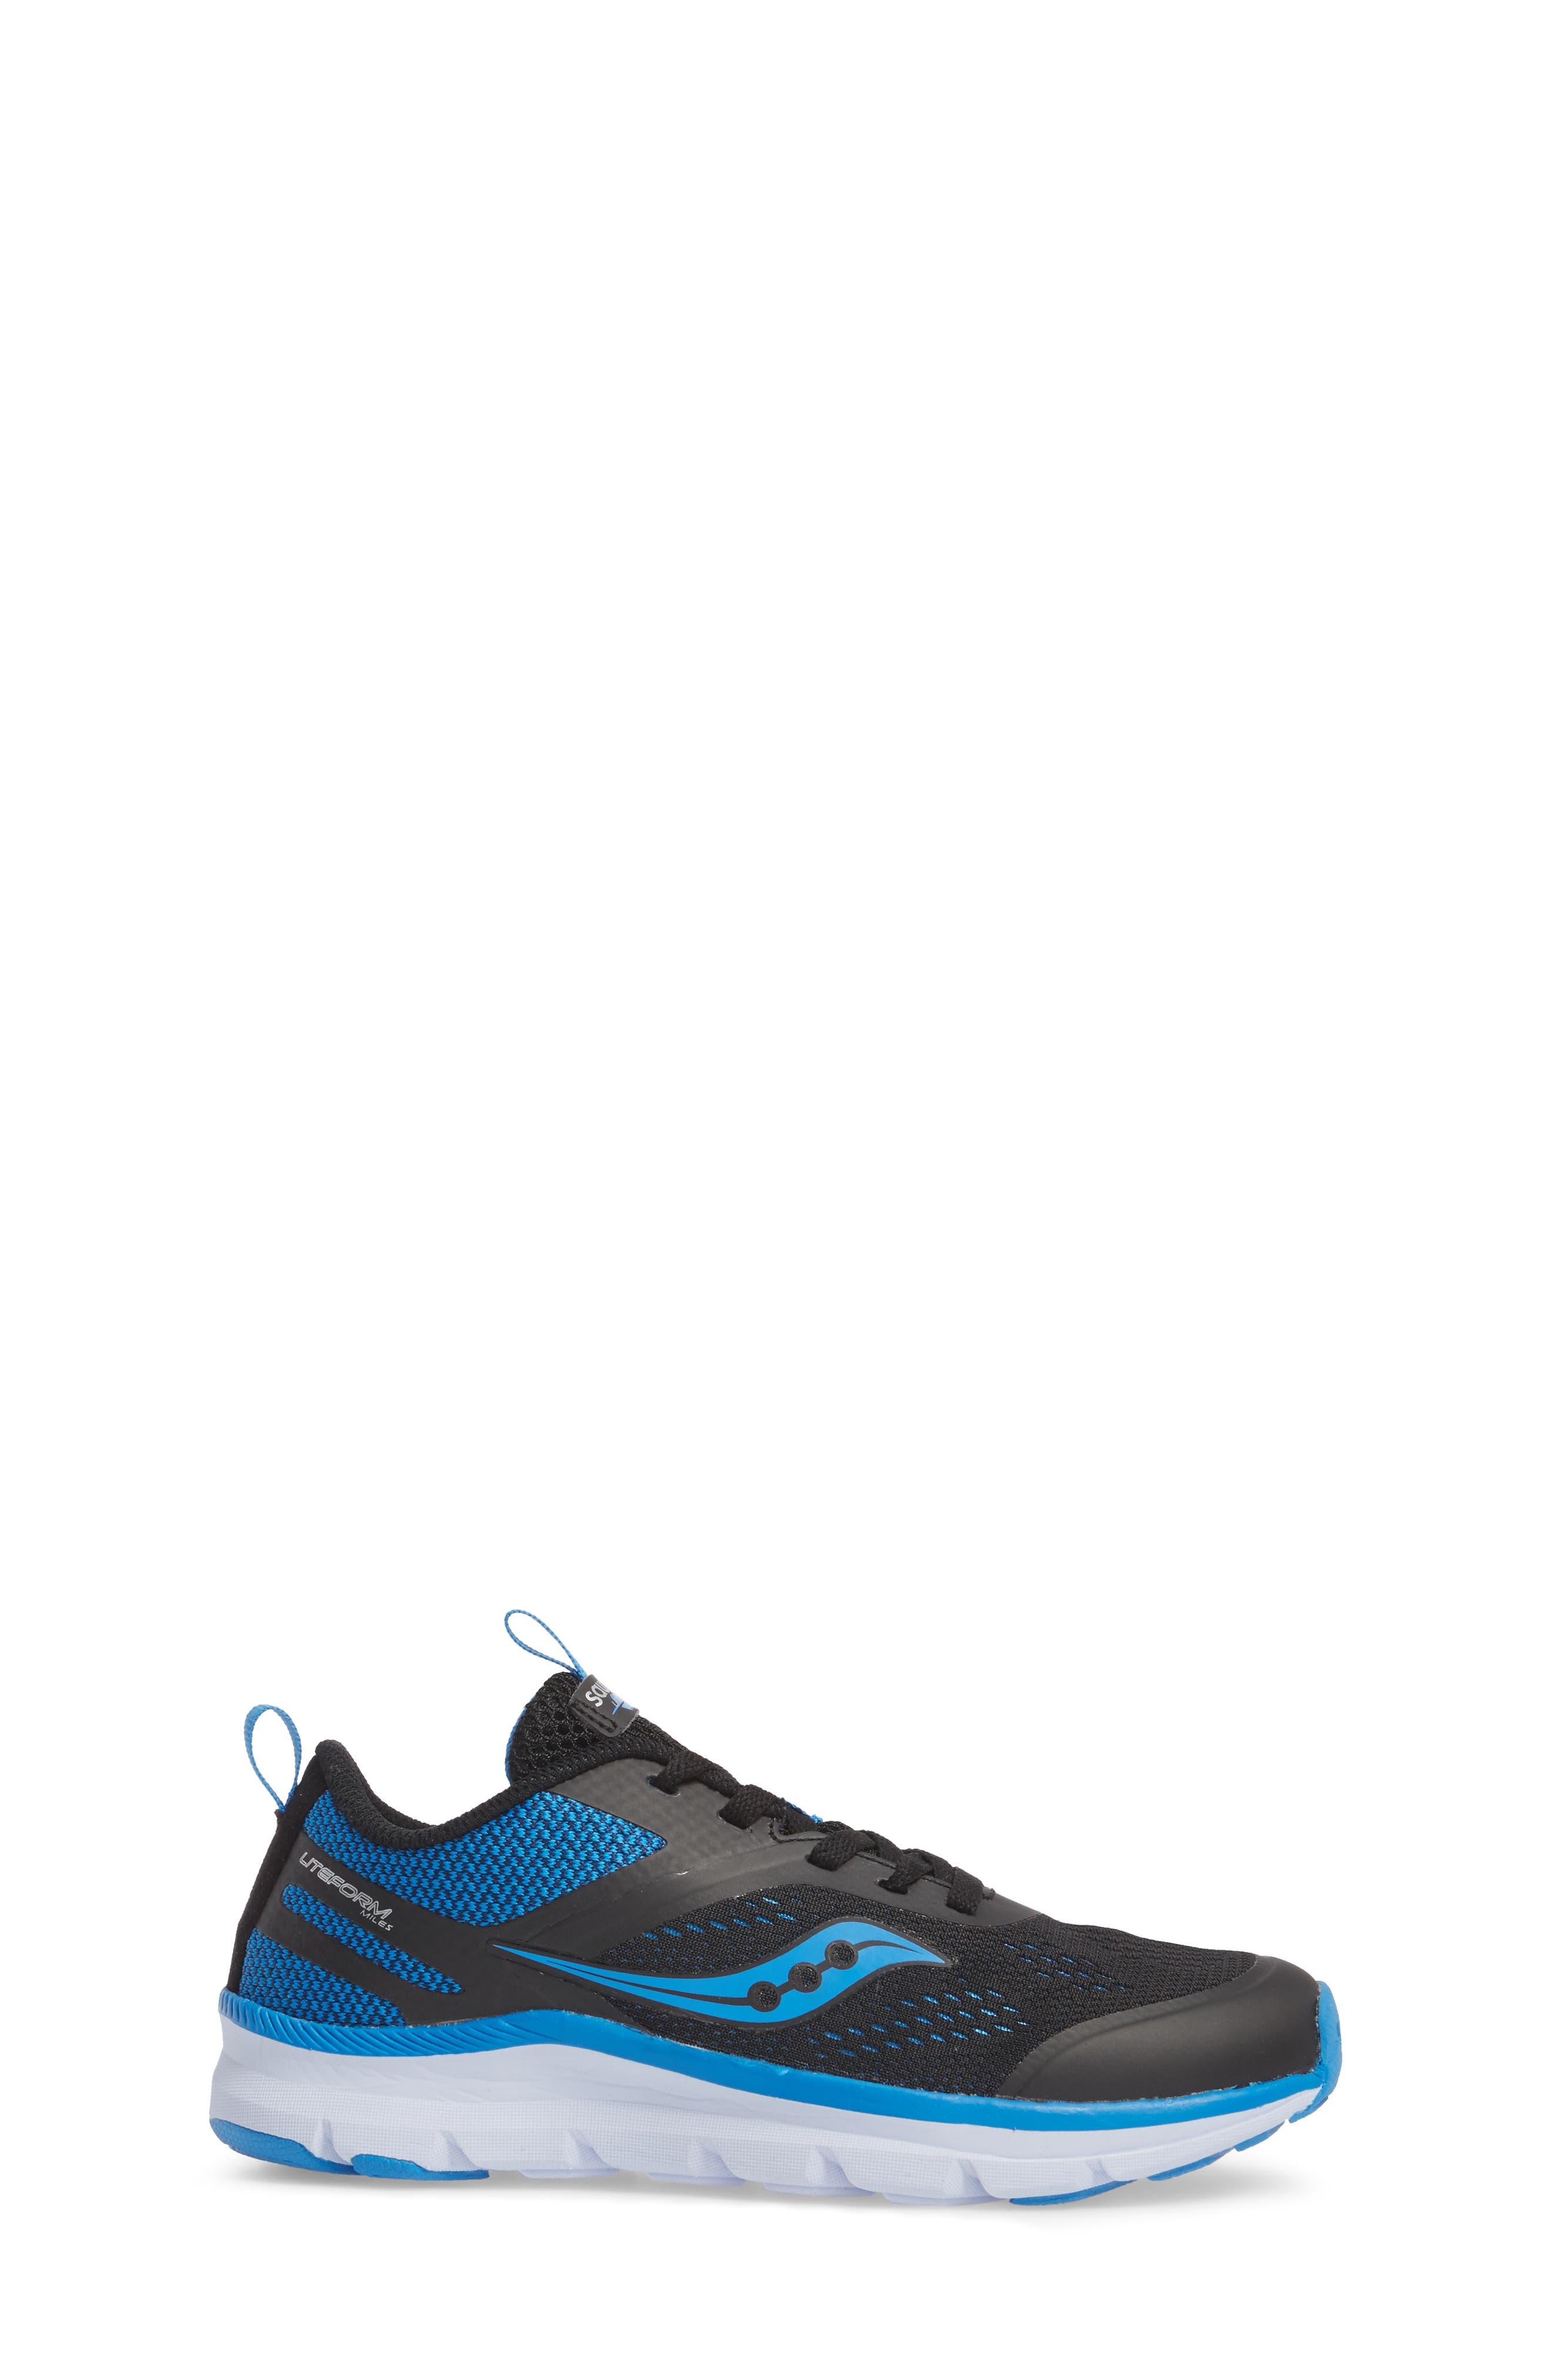 Alternate Image 3  - Saucony Liteform Miles Sneaker (Toddler, Little Kid & Big Kid)